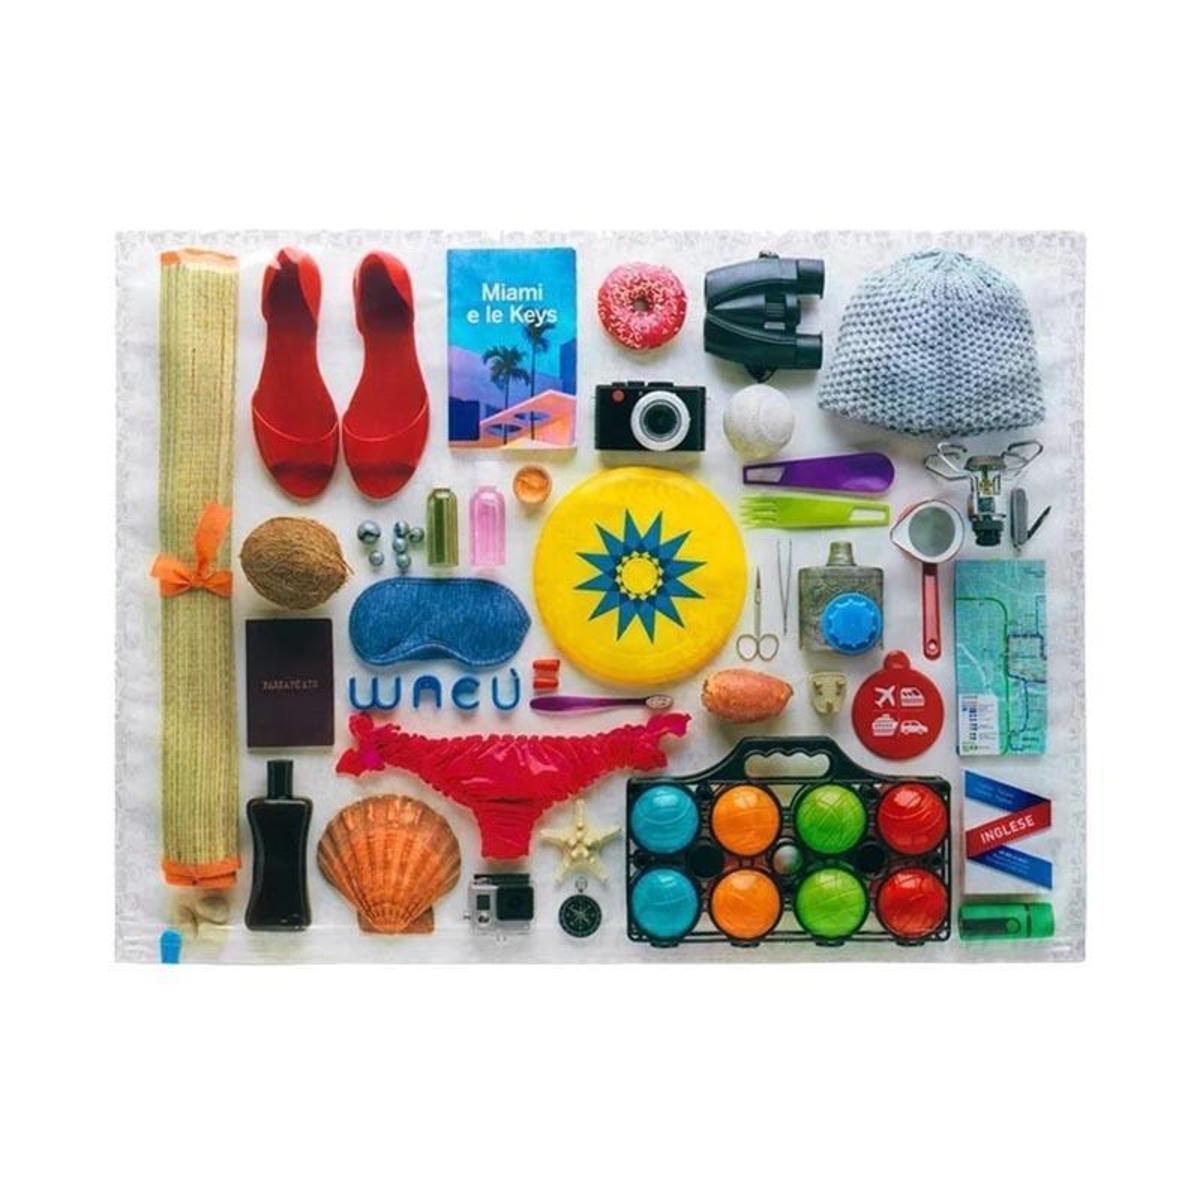 Wacù® vacuum bag 2 packs Italian brand - The Traveller / Small